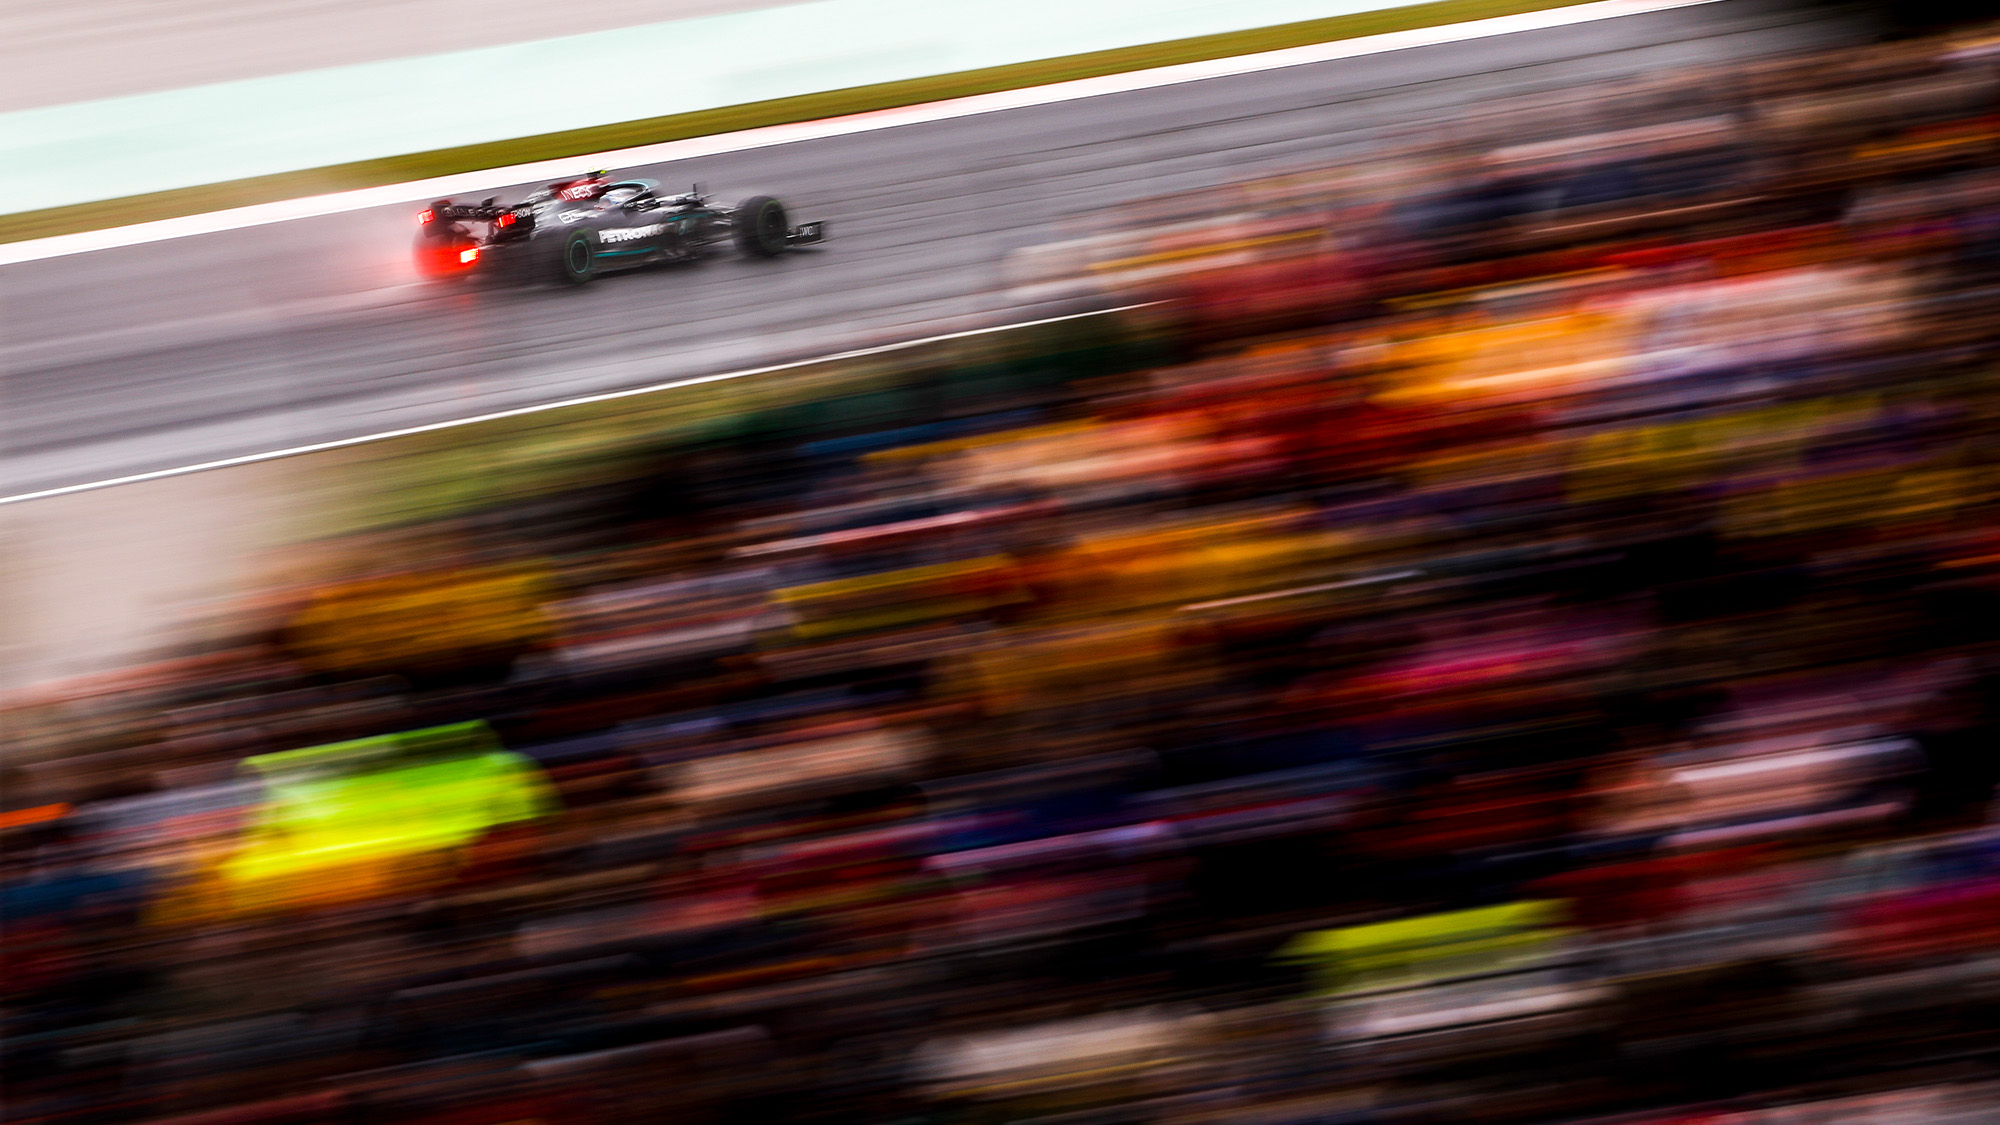 Blurred image of Valtteri Bottas at the 2021 Turkish Grand Prix